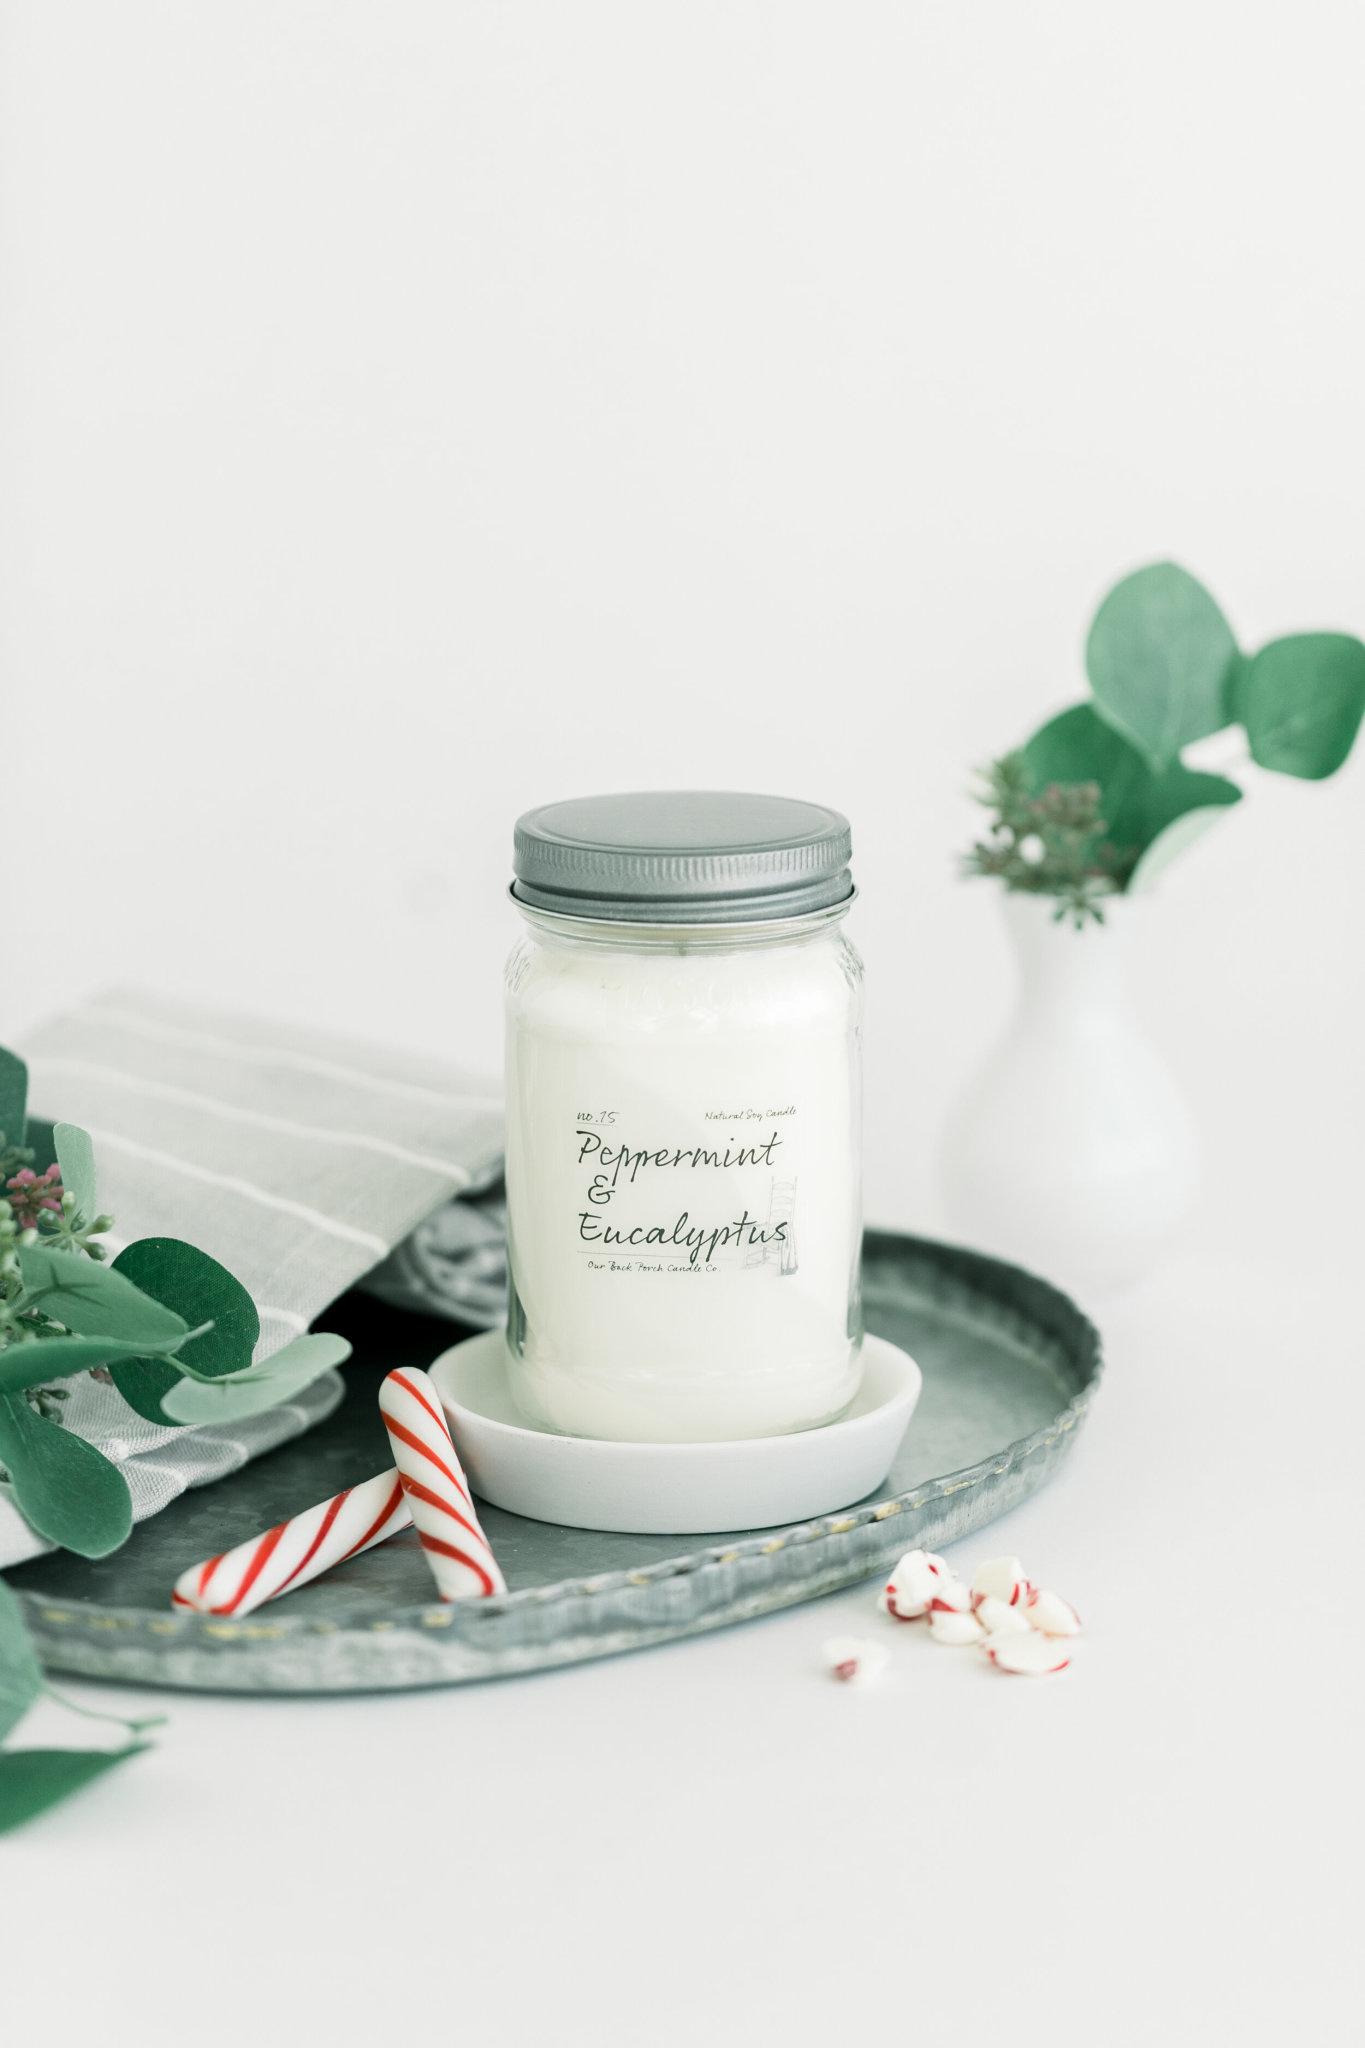 Peppermint & Eucalyptus 16oz Candle